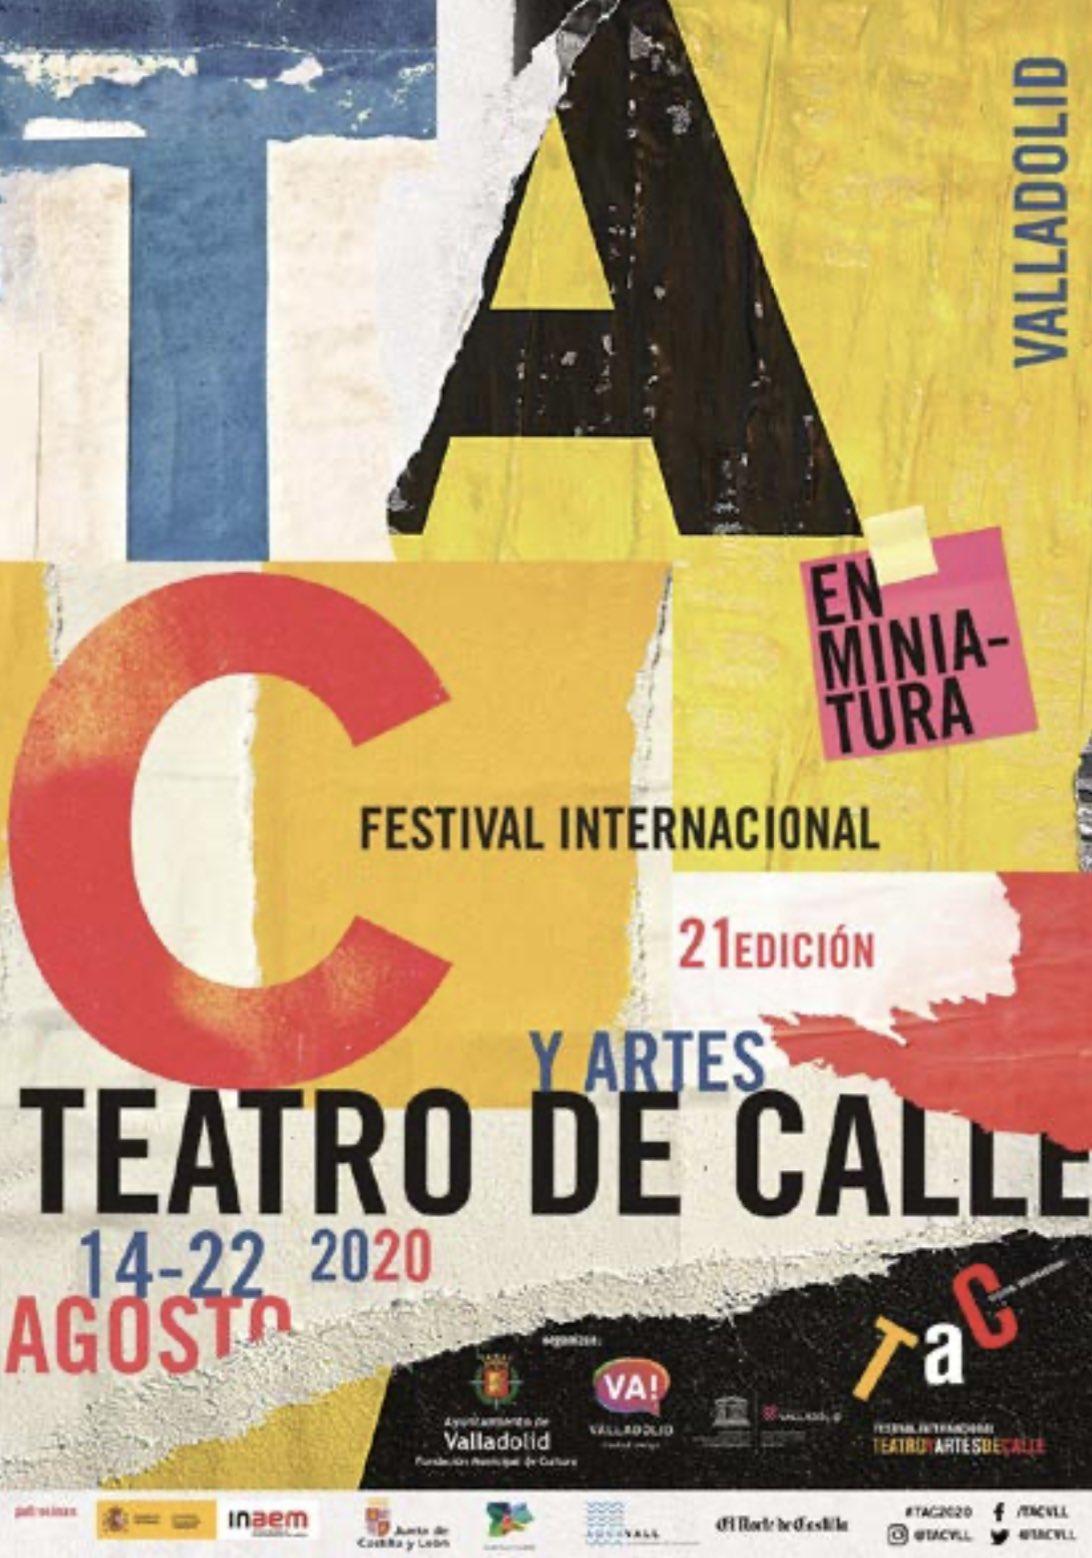 Cartel TAC Valladolid 2020